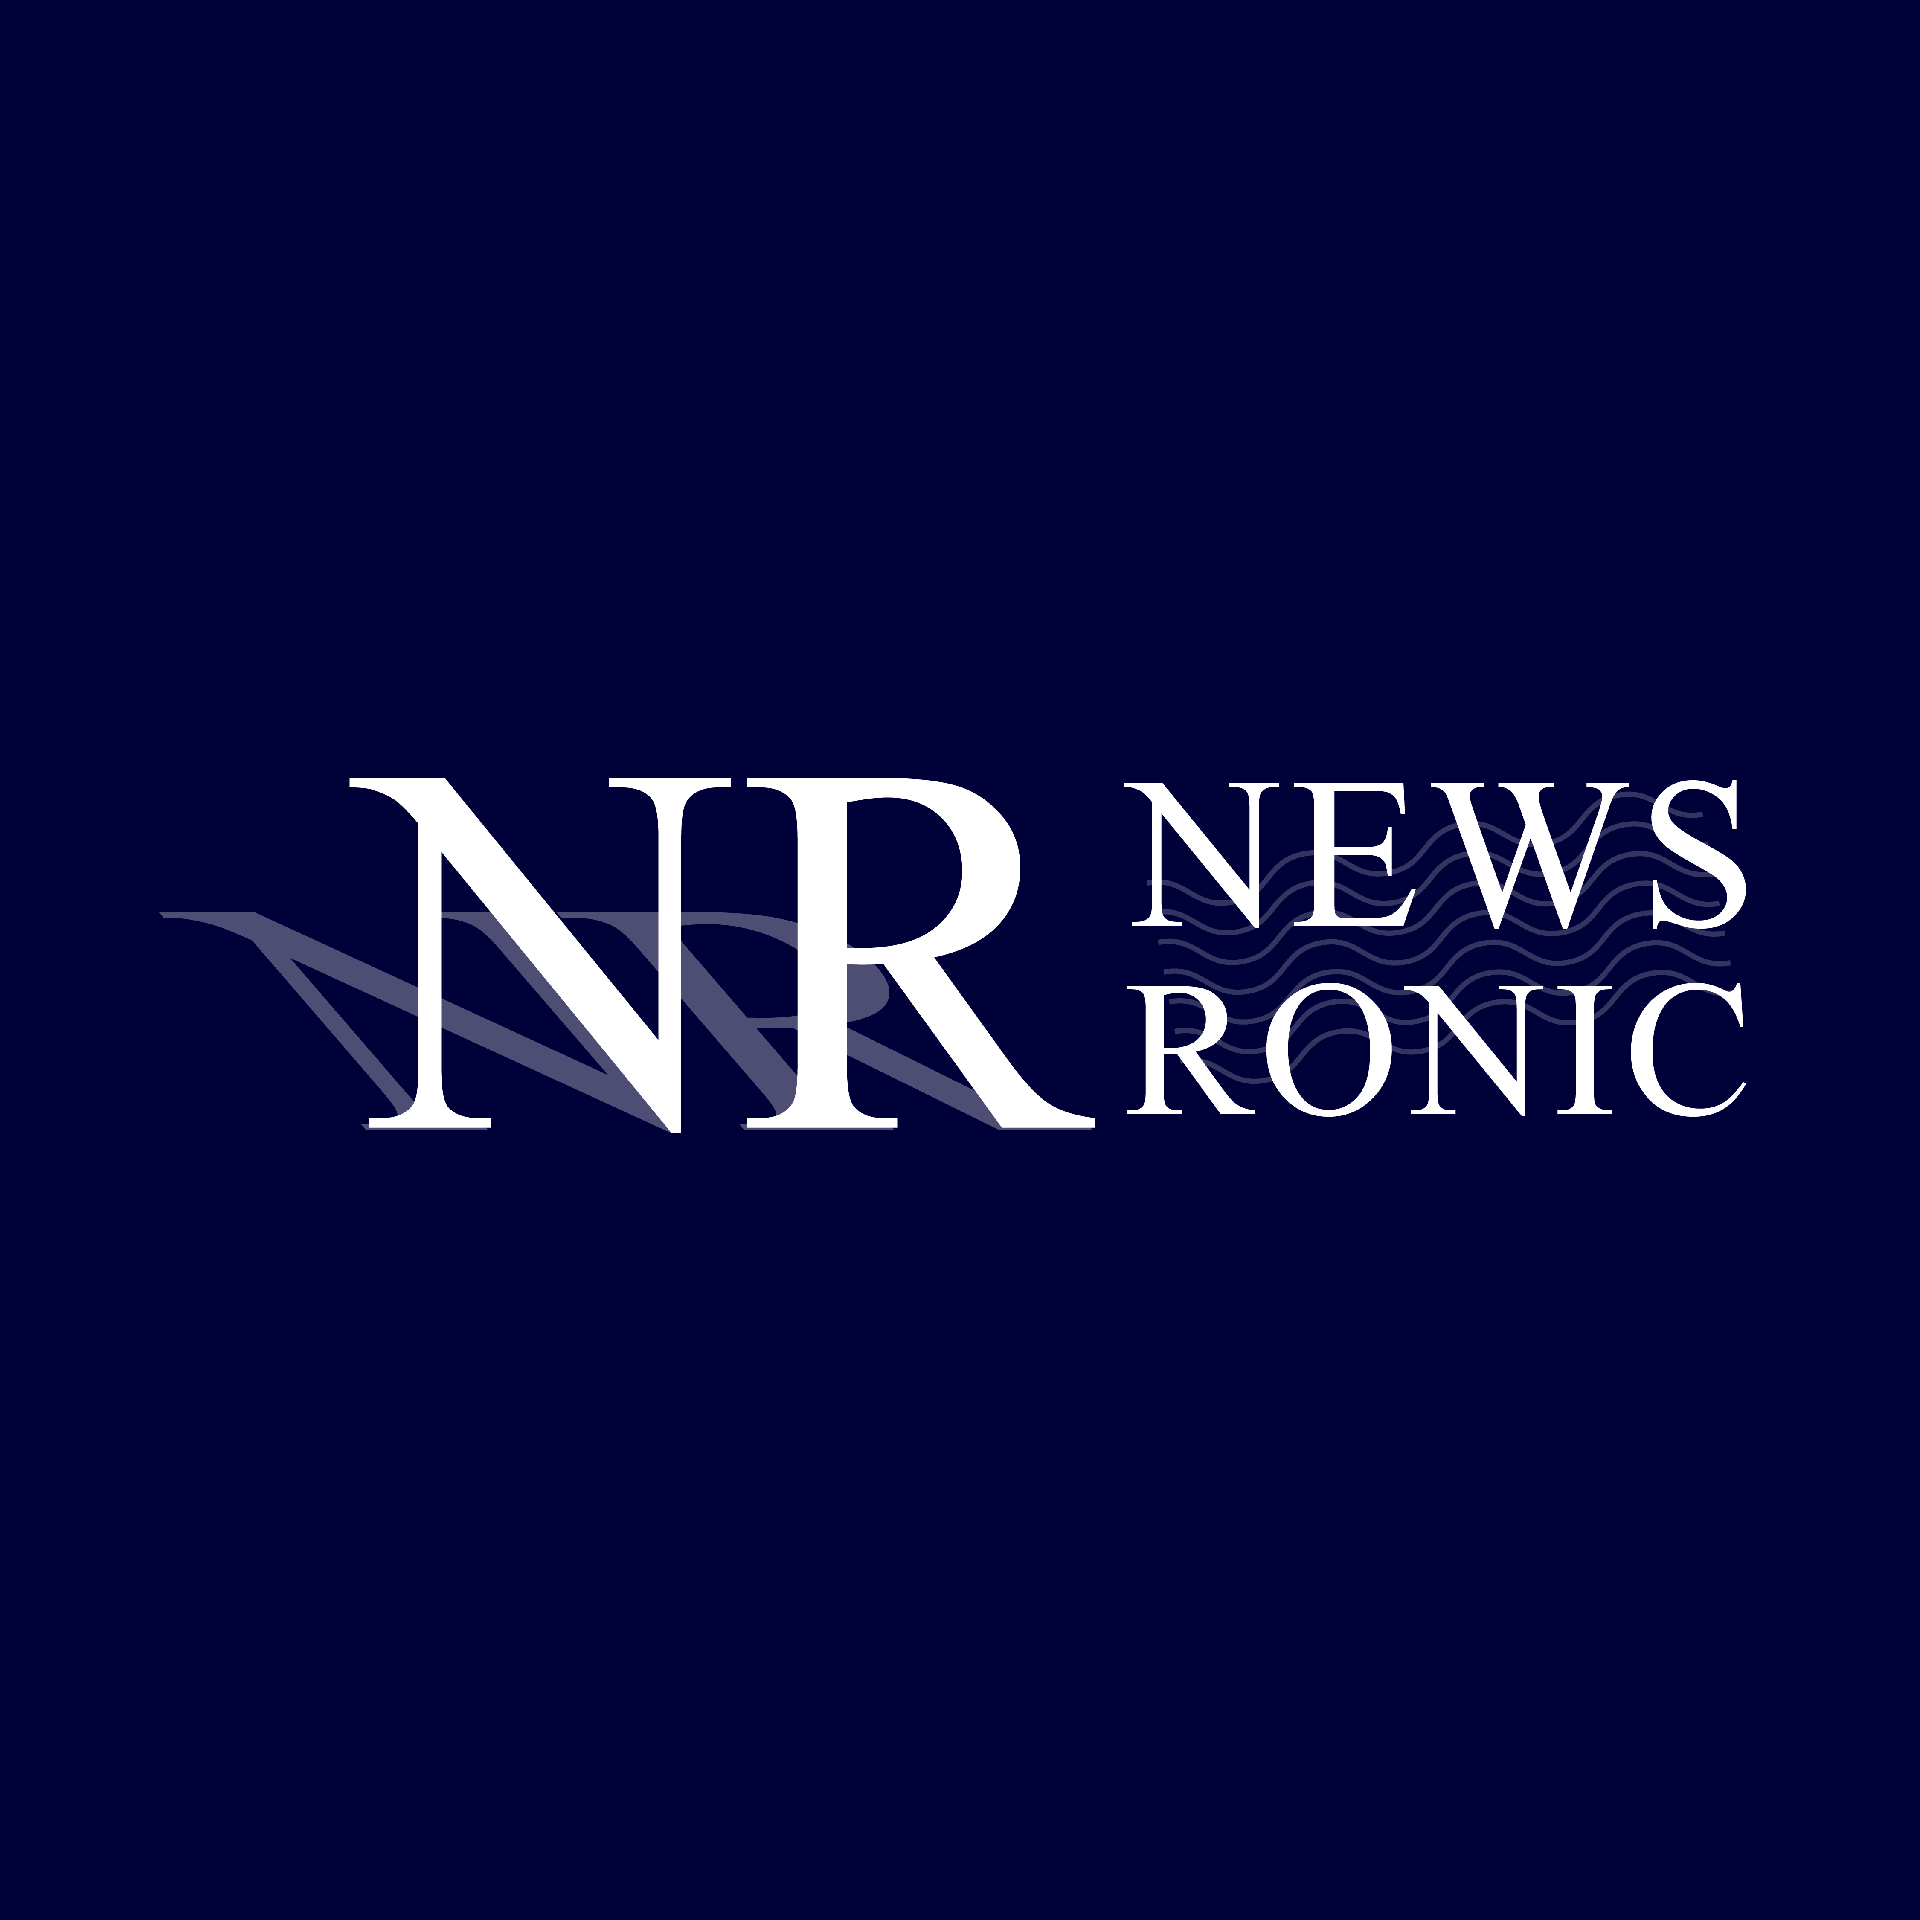 News Ronic